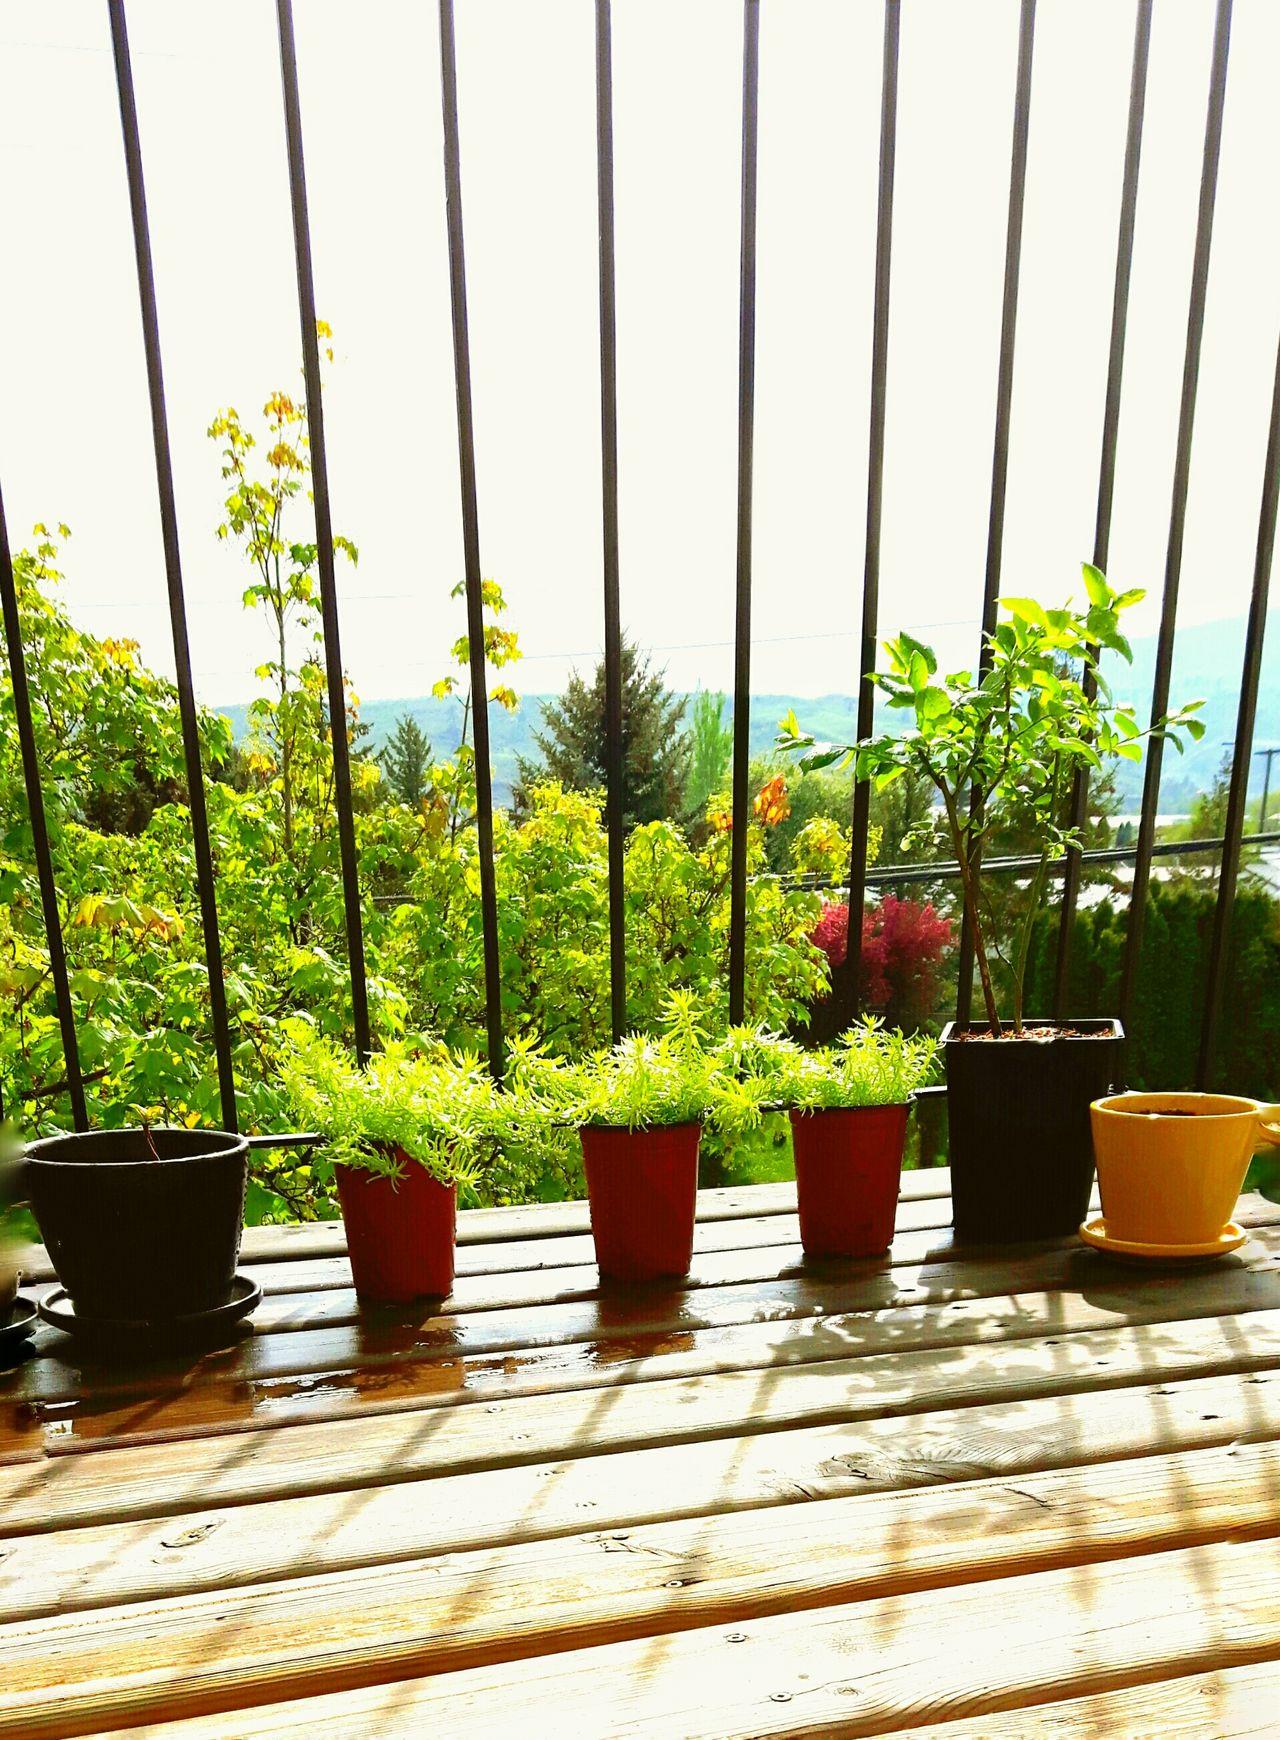 Patiogarden Green Green Green!  Loveplants Taking Photos Tree Enjoying Life